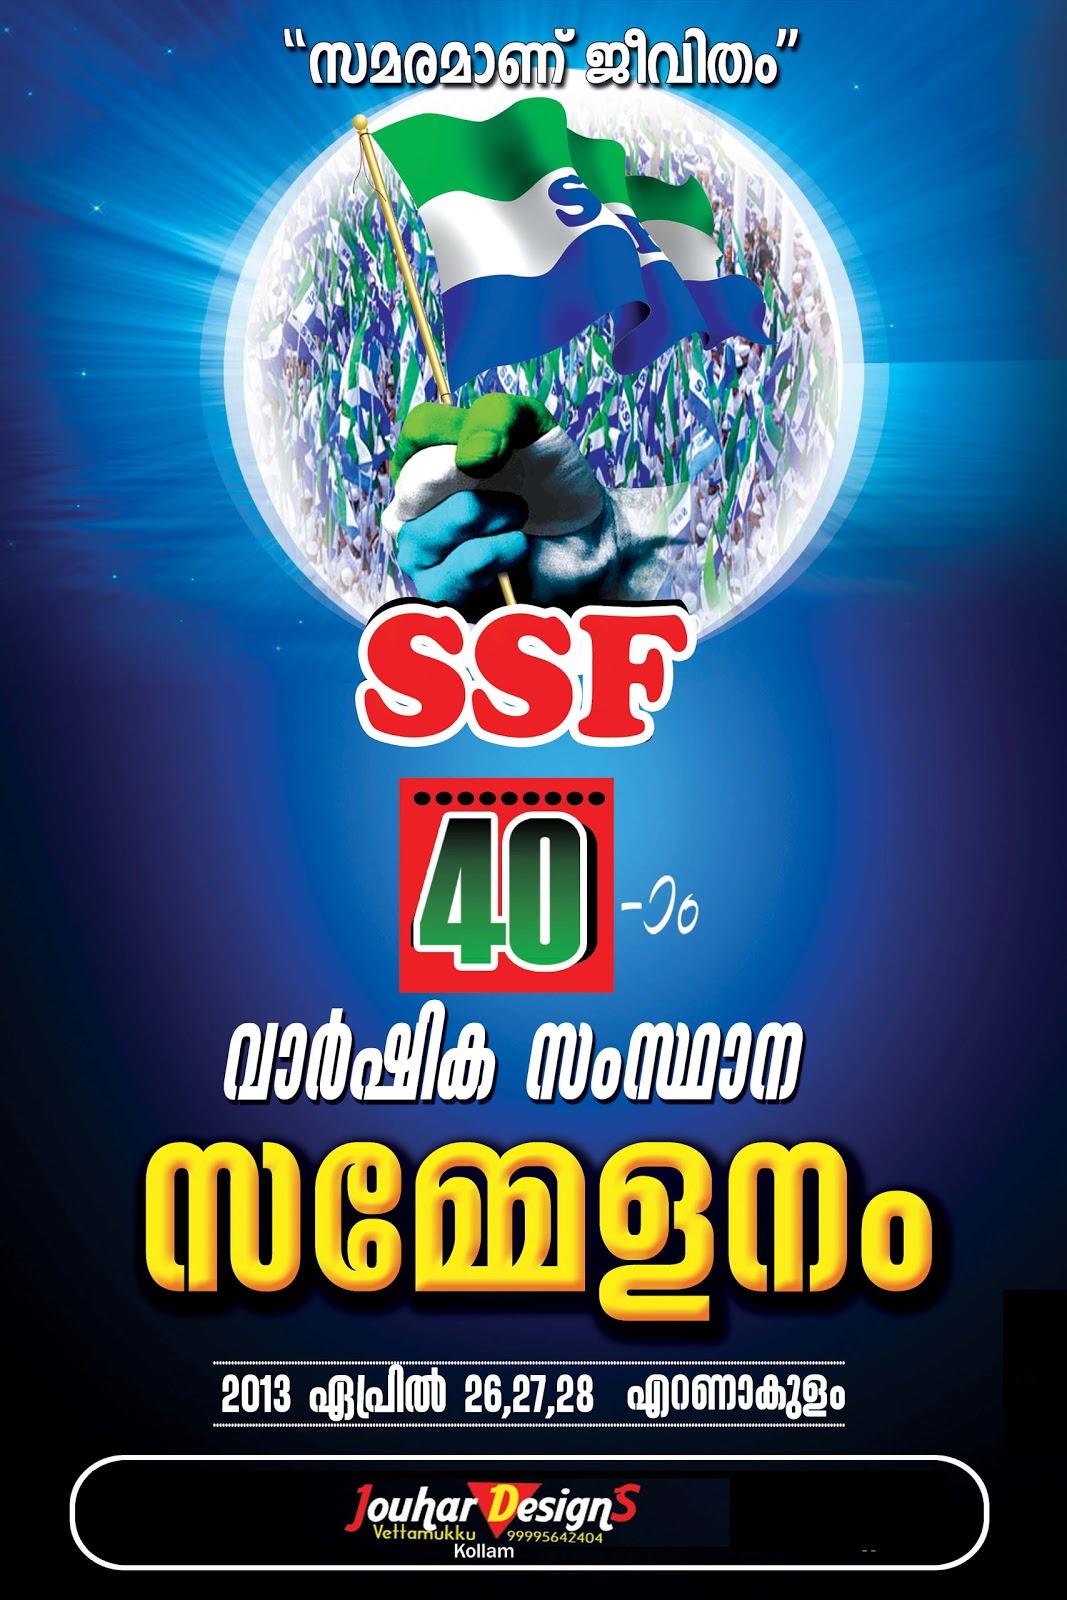 Jouhar designs kollam ssf 40th anniversary for Ssf home designs